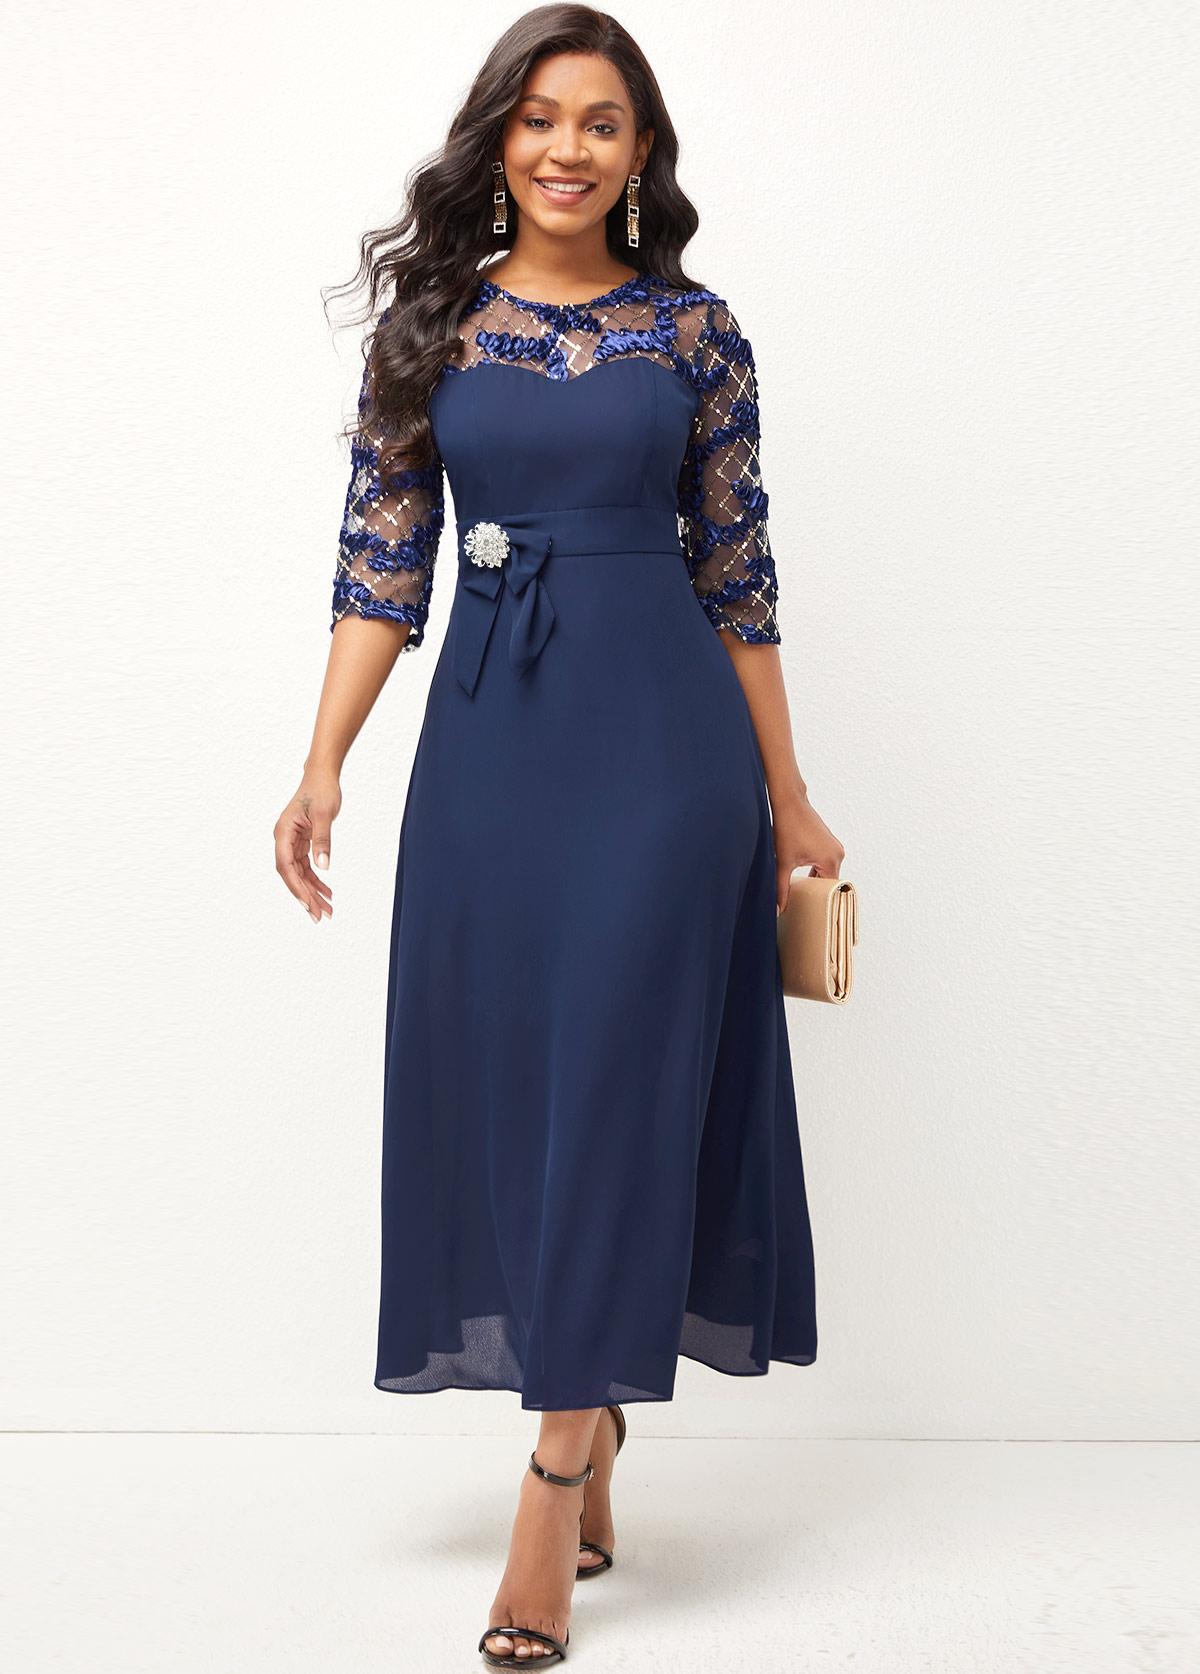 ROTITA Shining Lace Stitching Round Neck 3/4 Sleeve Dress